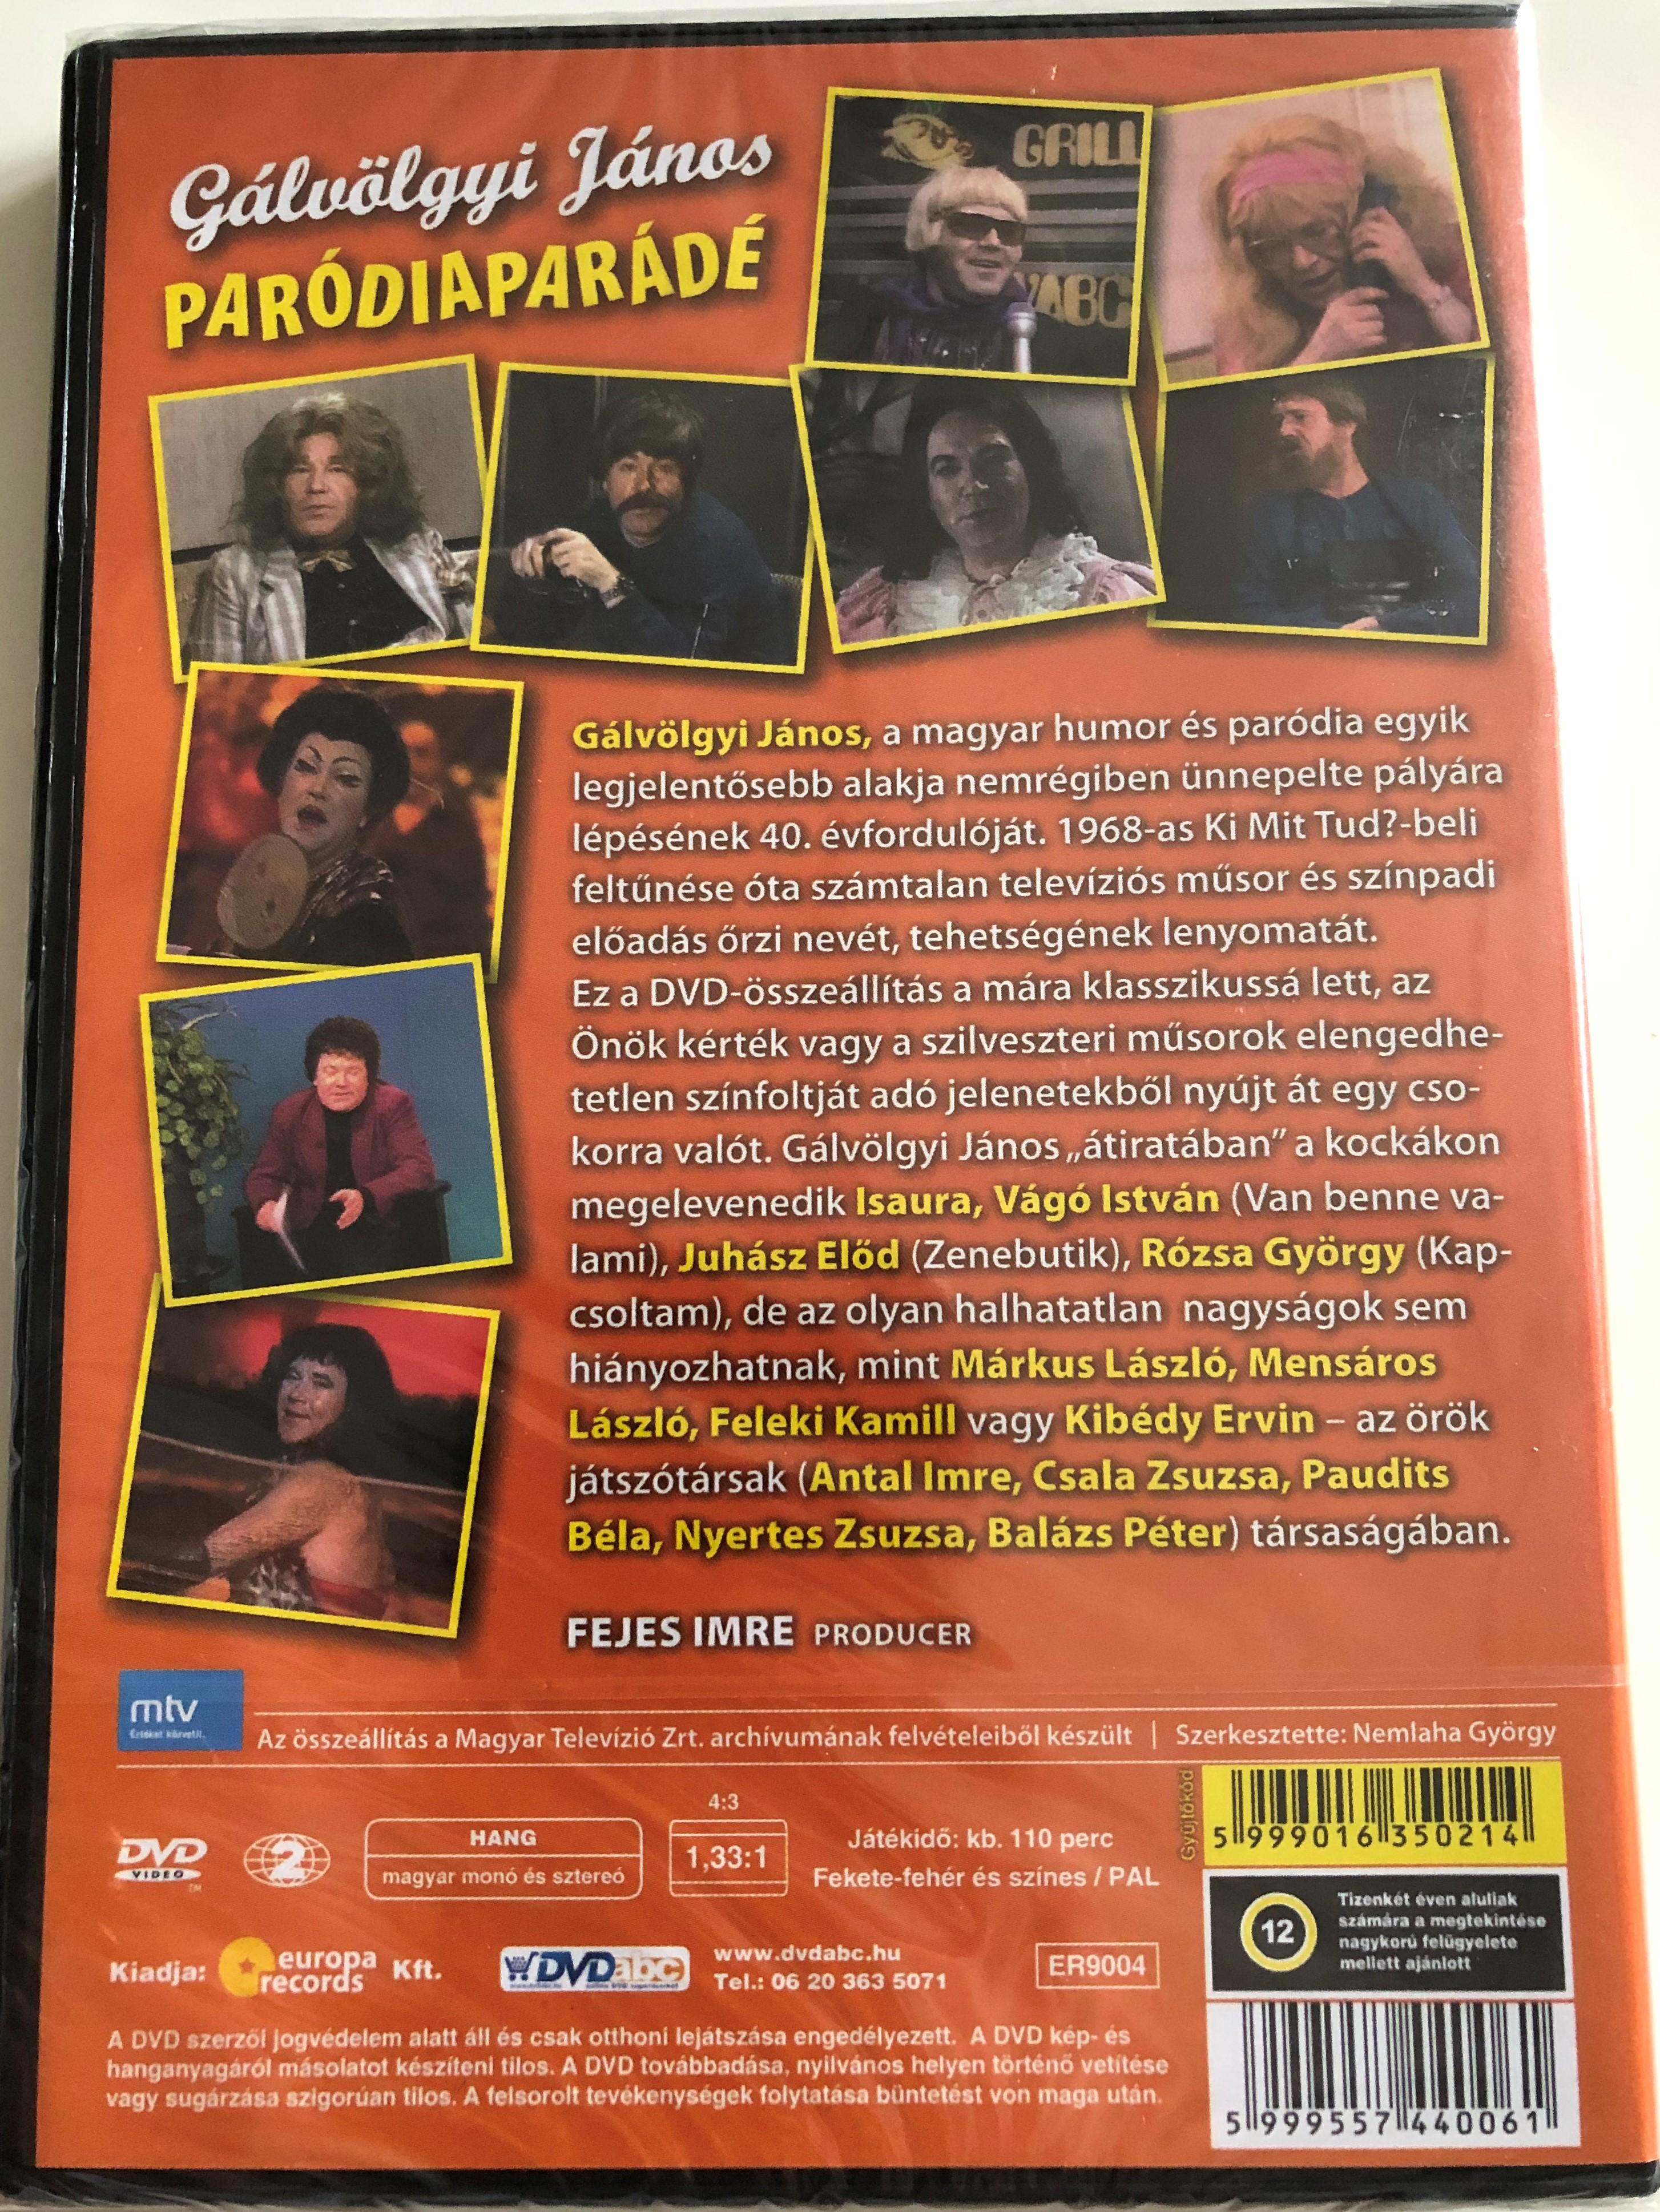 g-lv-lgyi-j-nos-parodiapar-d-dvd-hungarian-parody-show-2.jpg